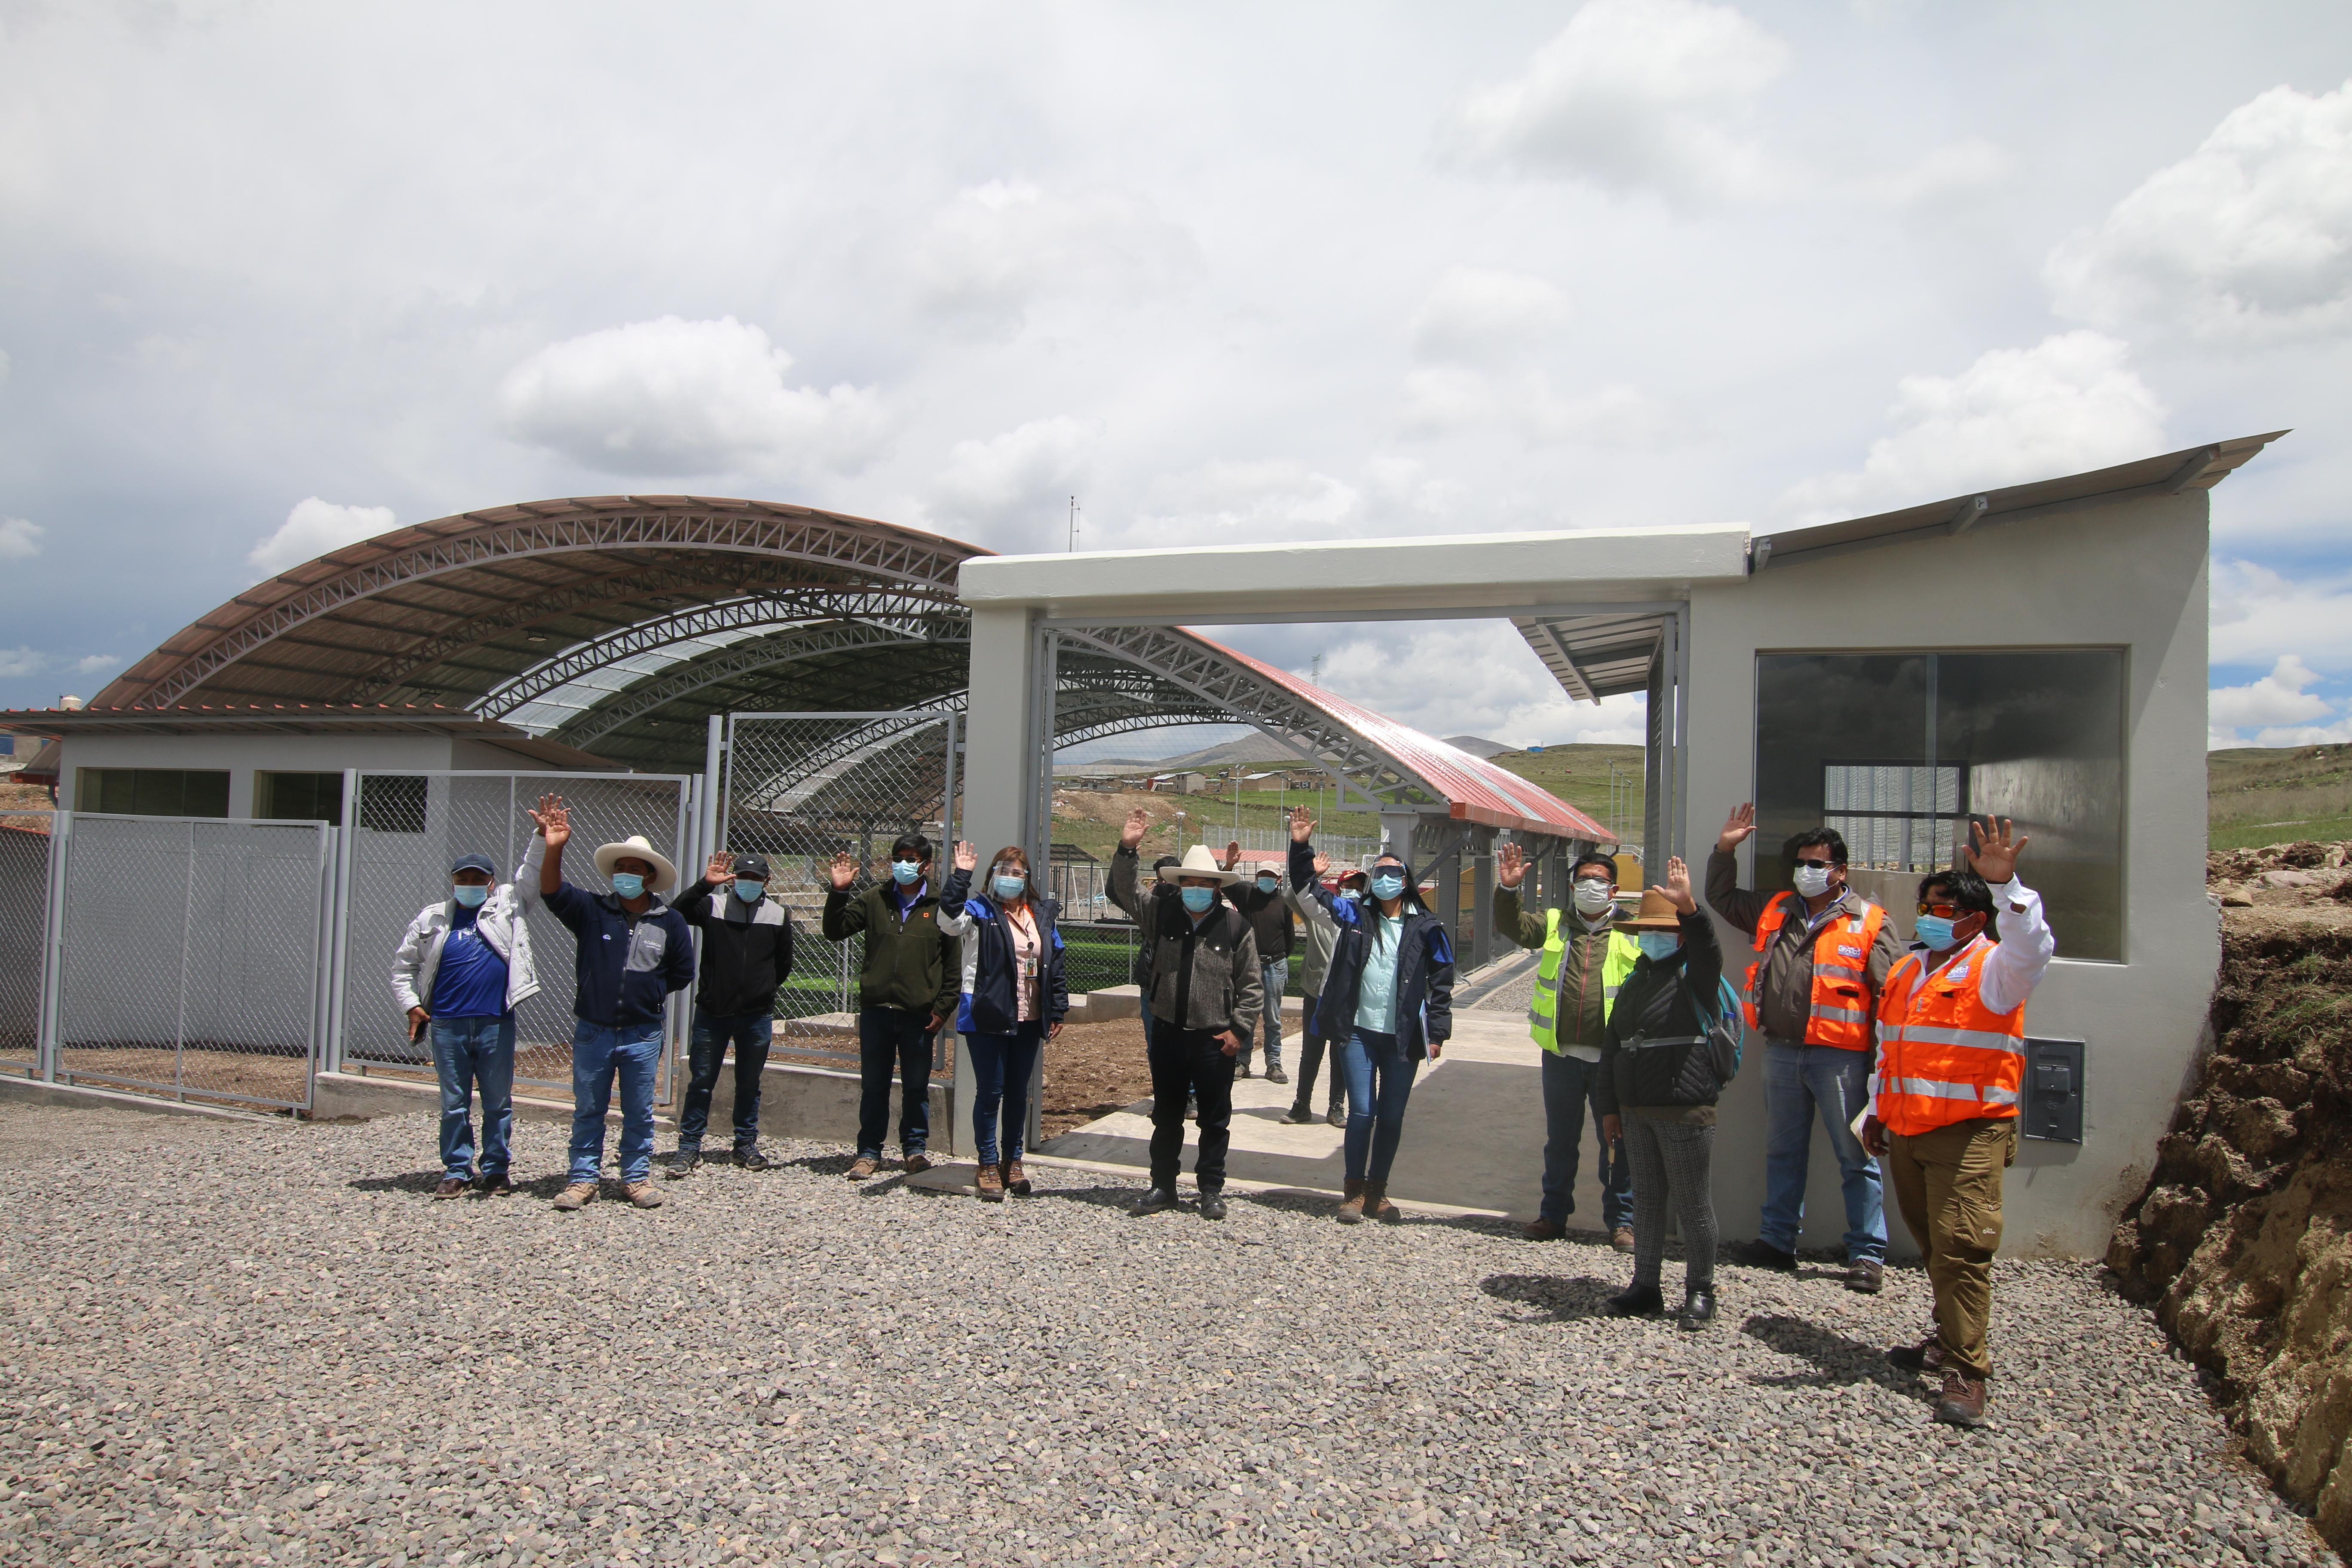 Antapaccay entregó cancha sintética, losa deportiva y parque infantil a Tintaya Marquiri